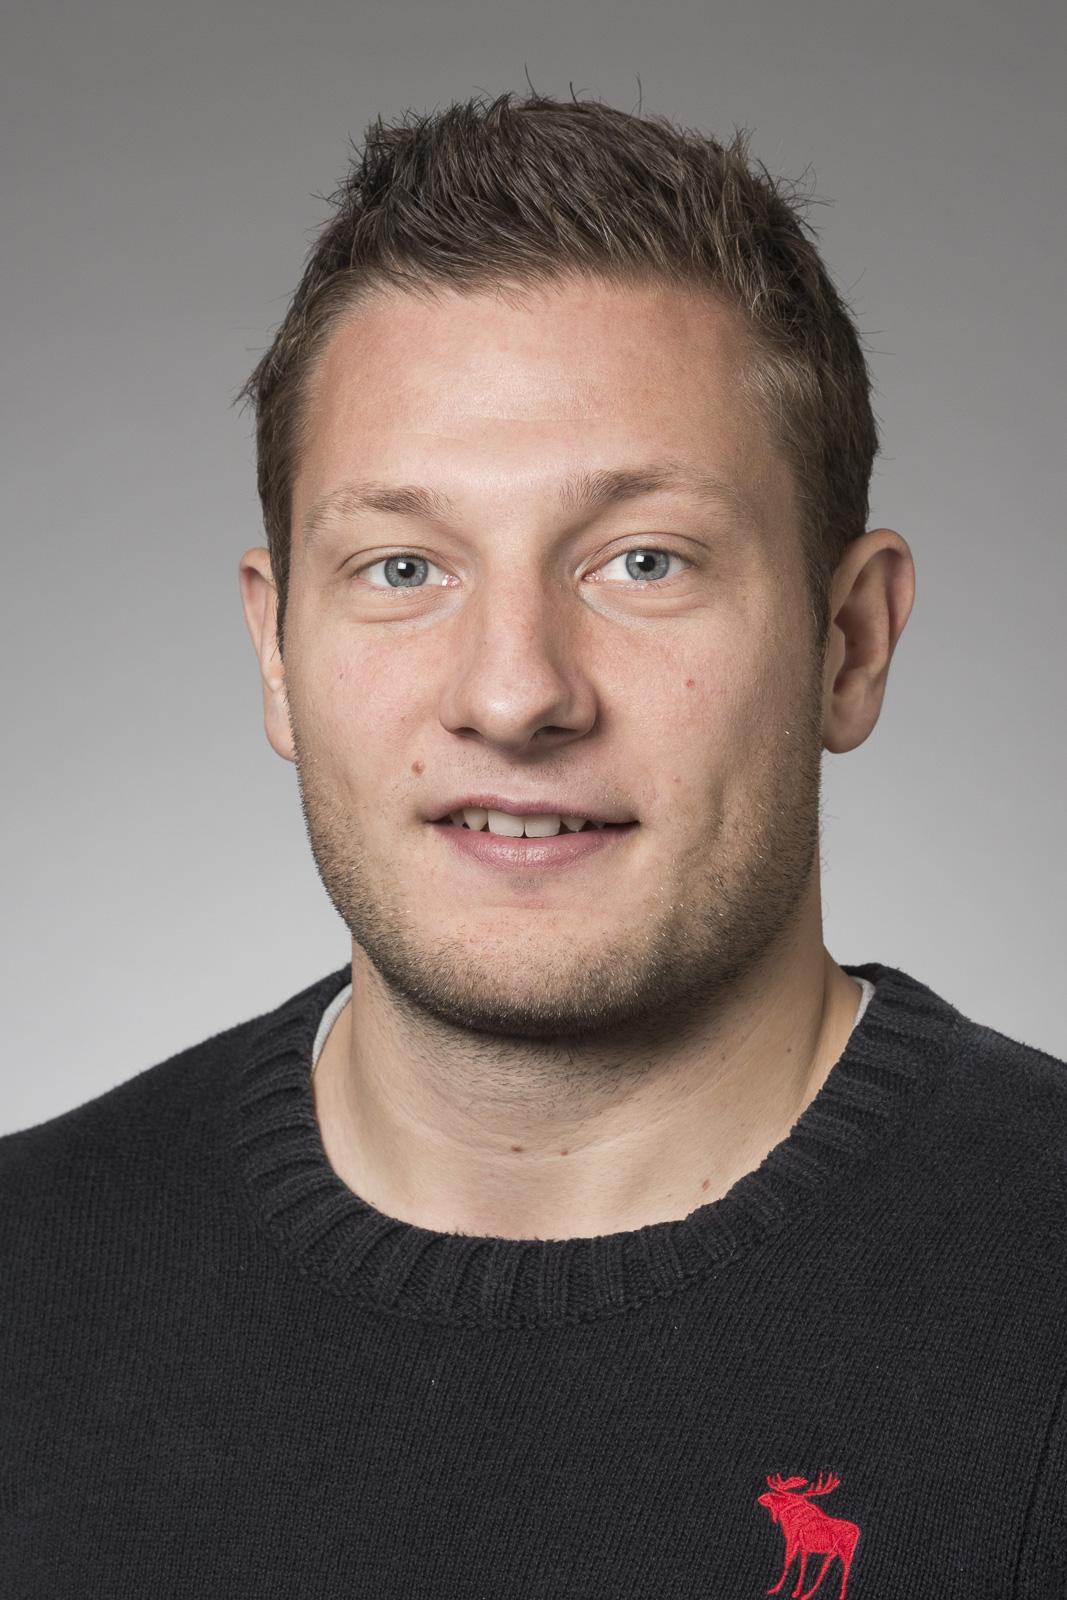 Morten Lyberth Grunnet